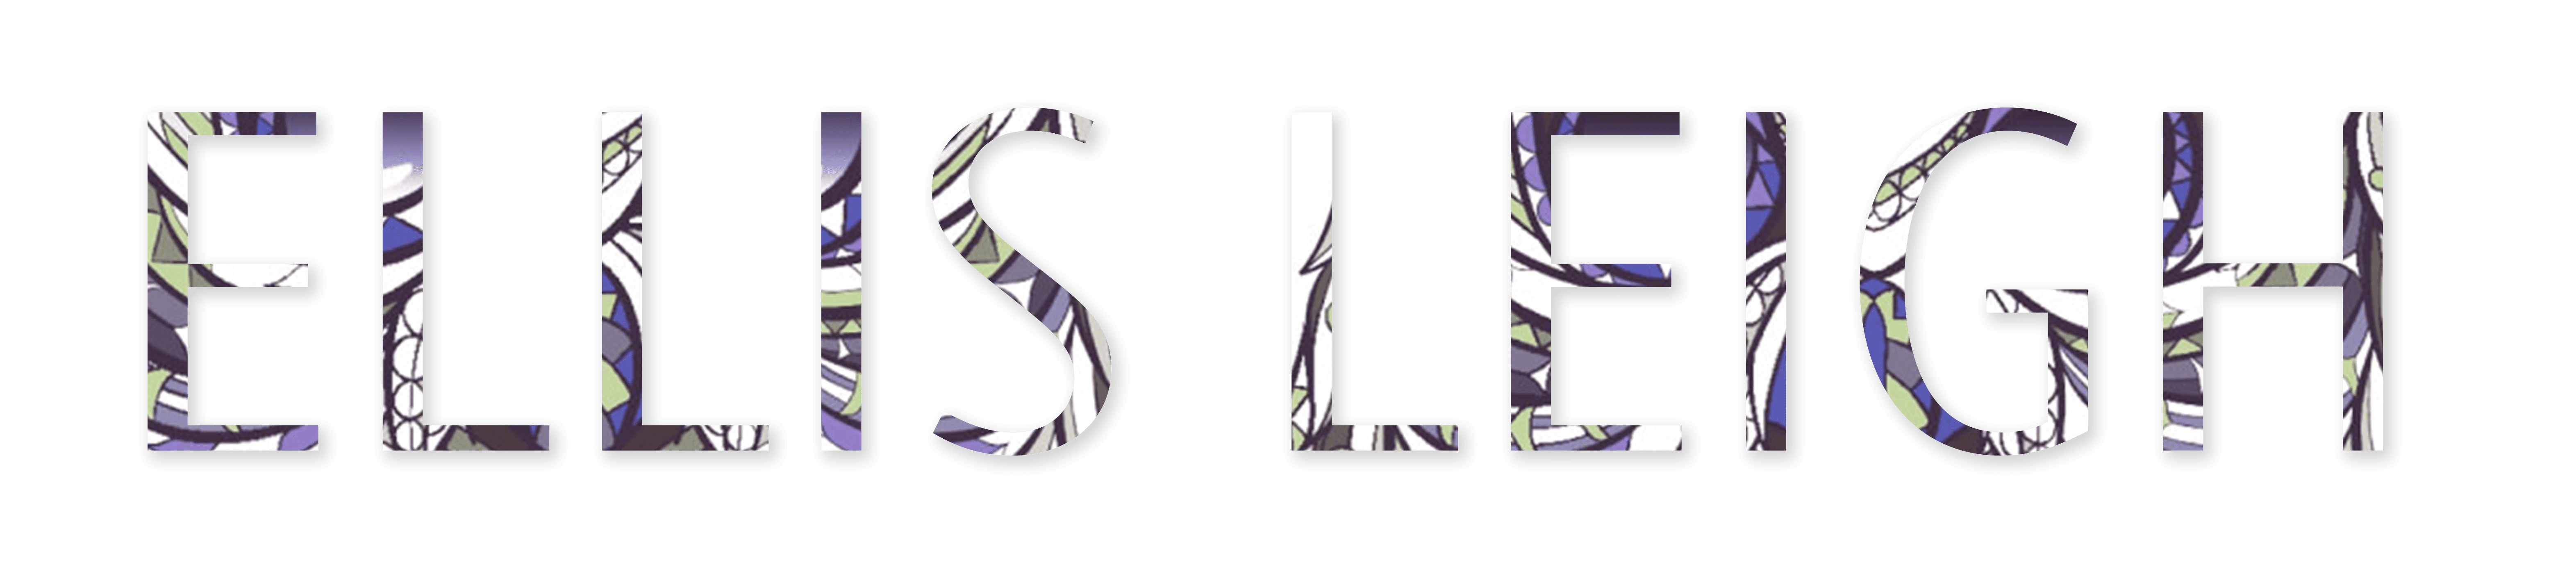 Ellis Leigh in sans serif font